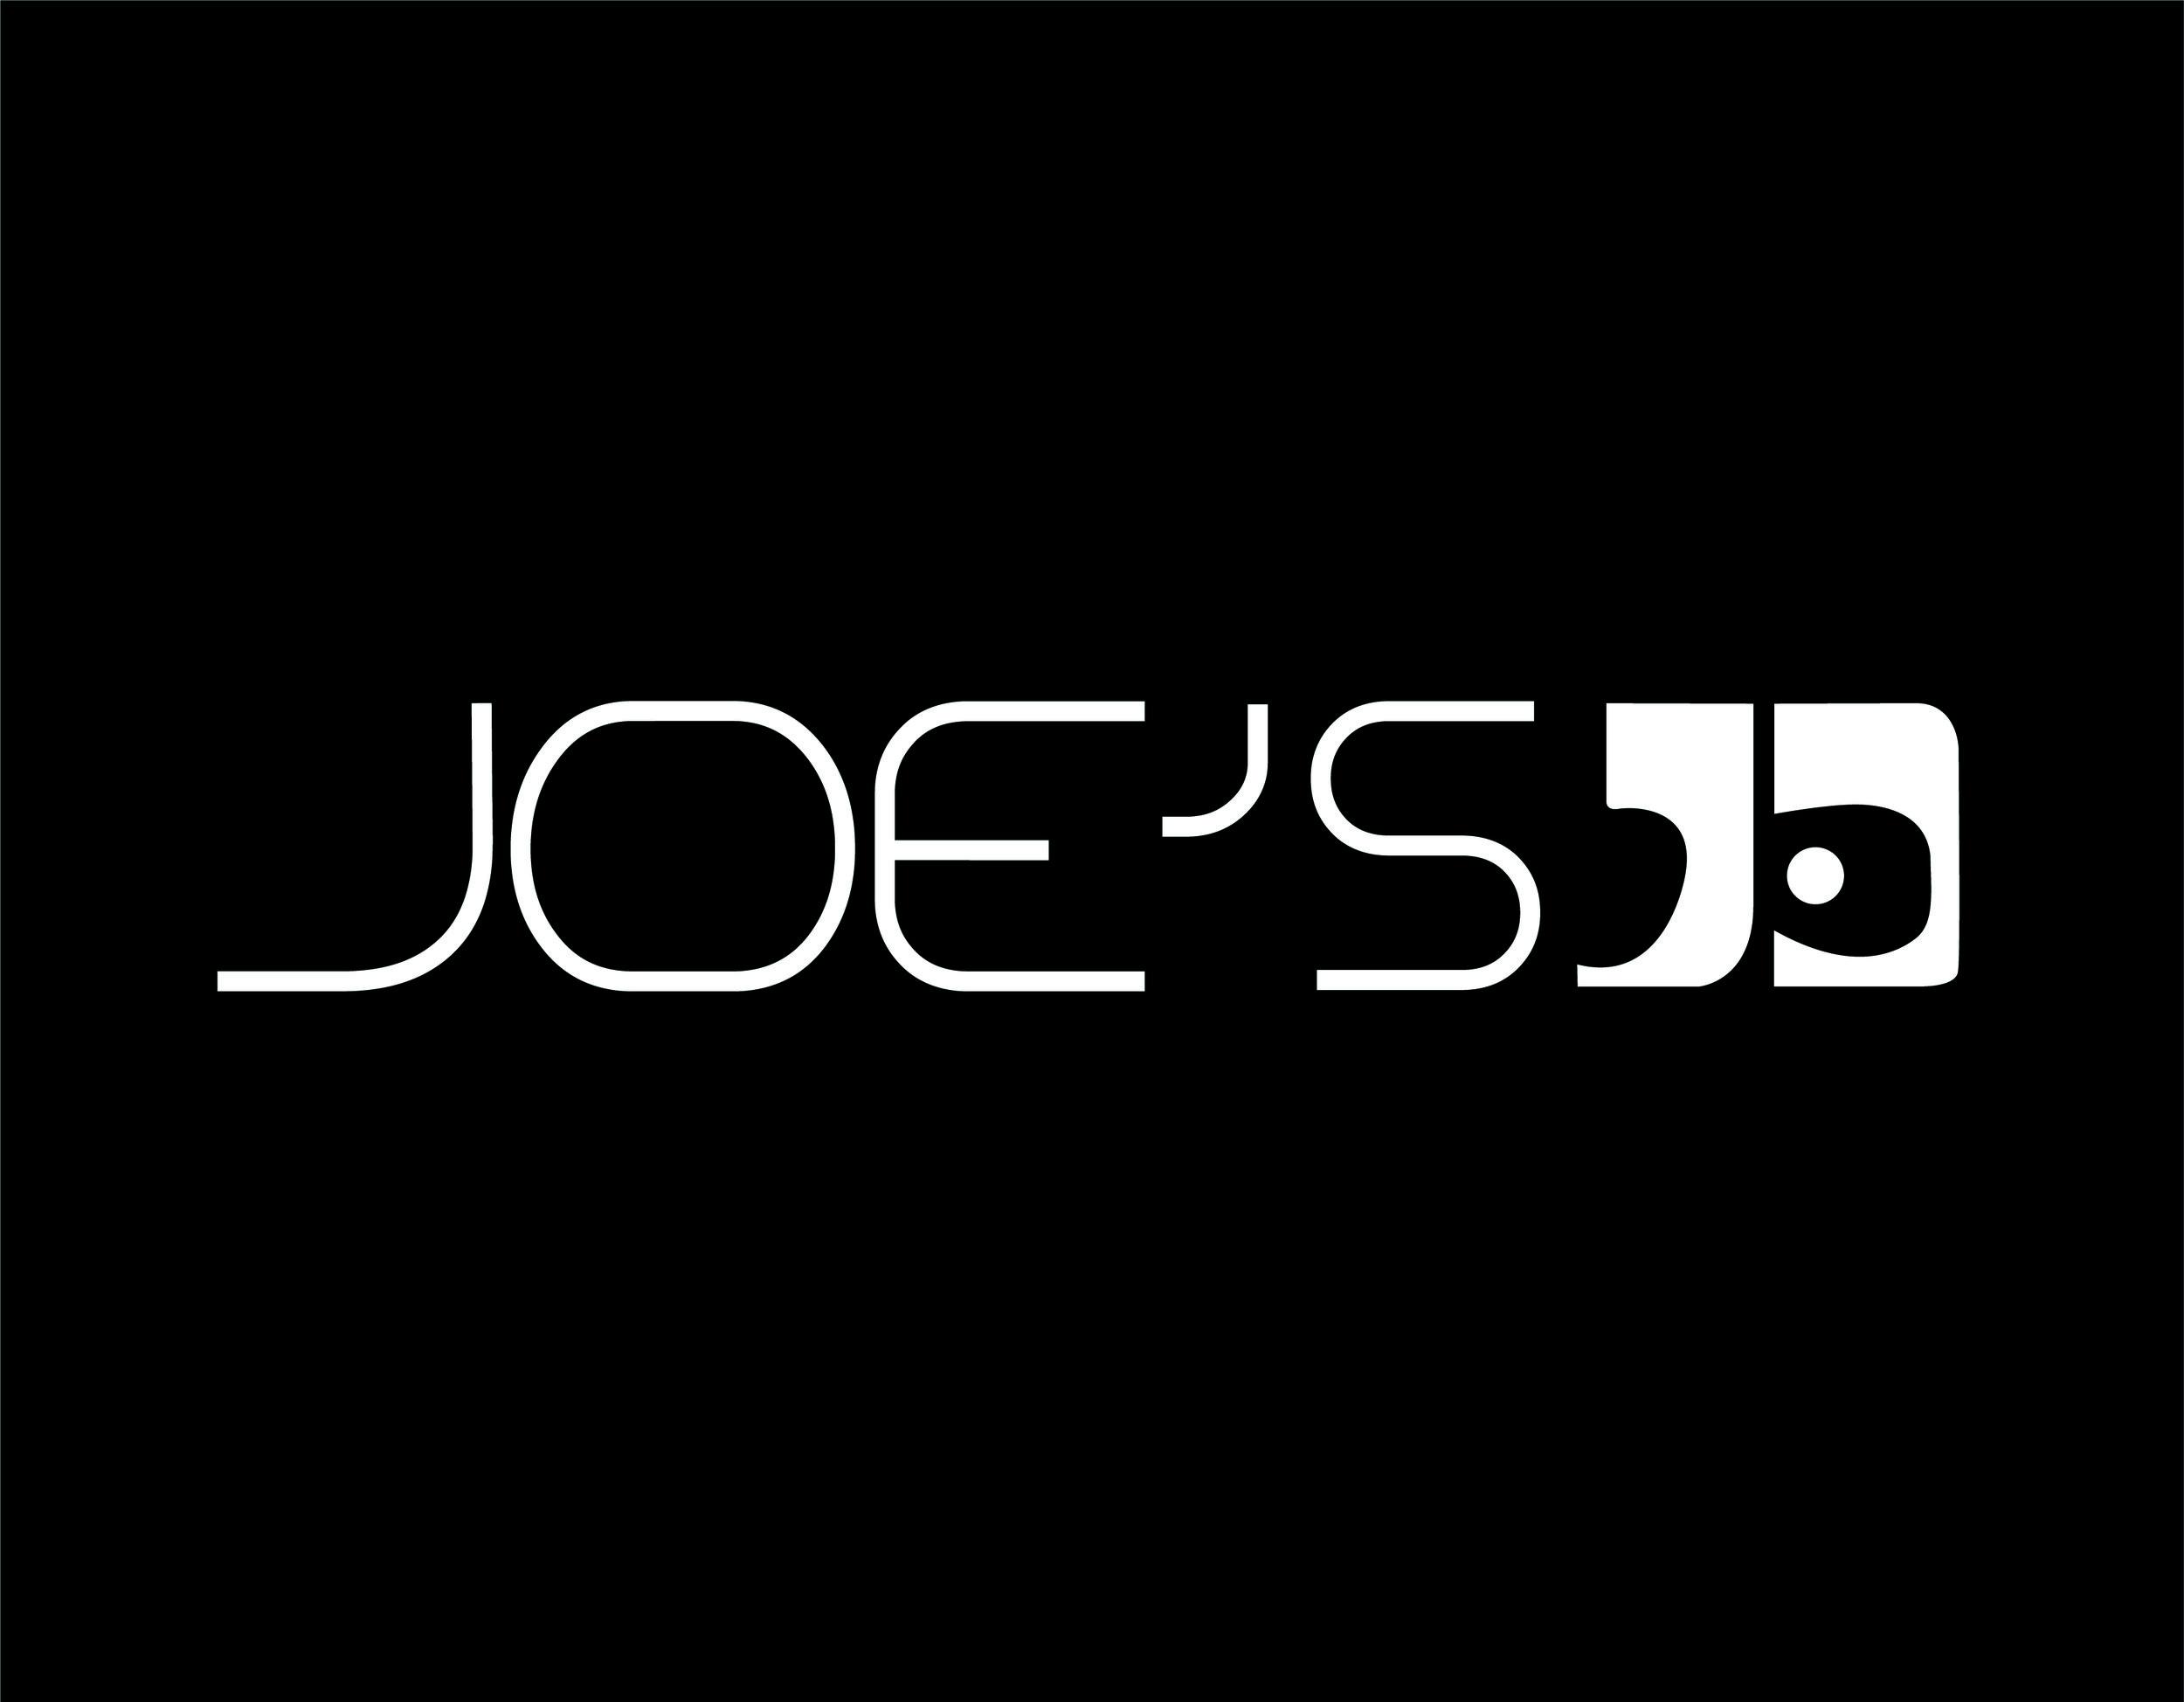 JOES-white.jpg